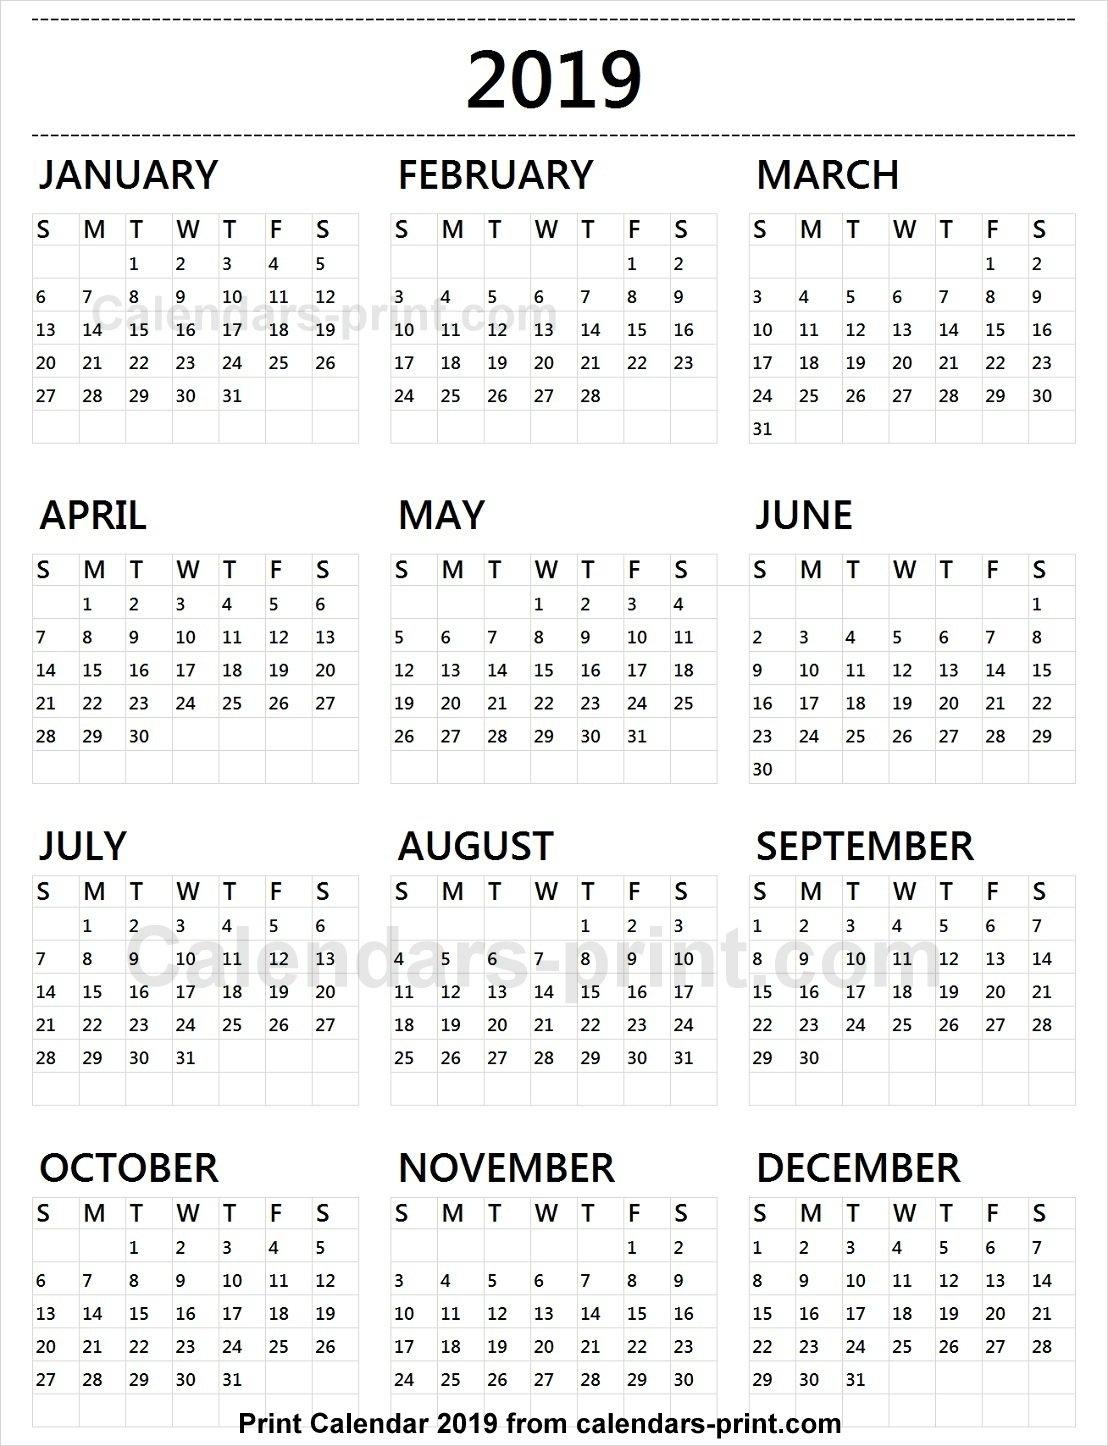 Calendar 2019 Tumblr To Print Free   Download Blank Pdf Template Calendar 2019 Print Free